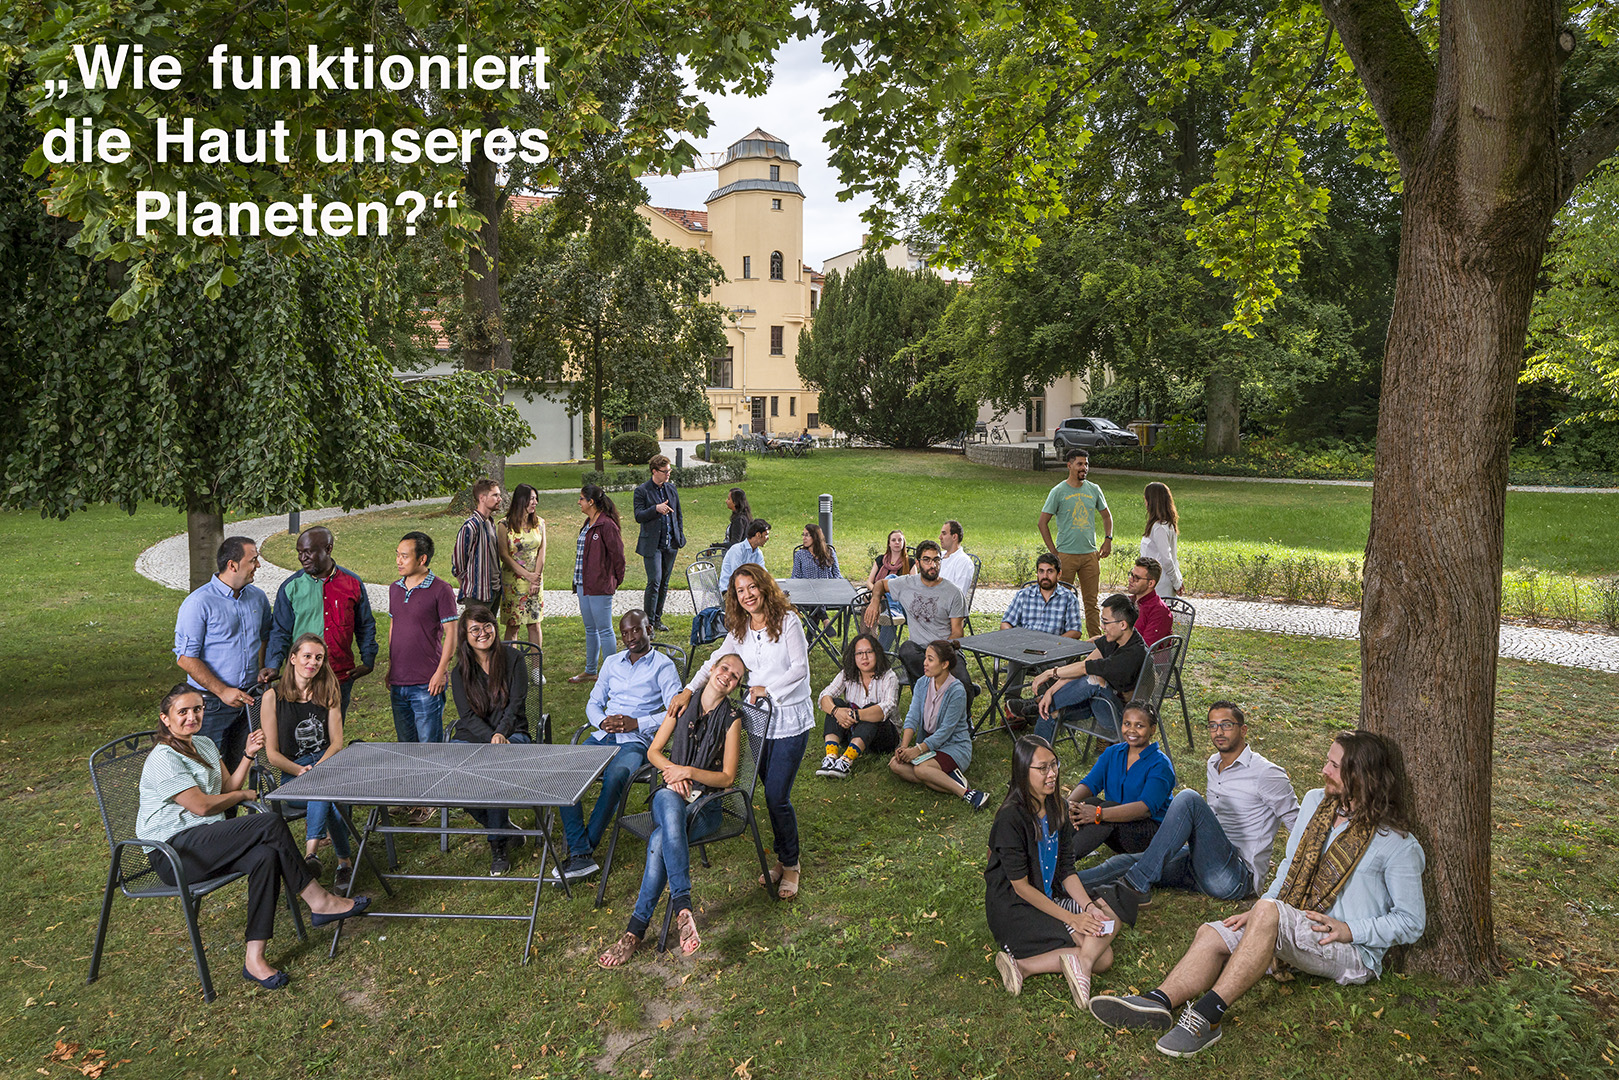 Institute for Advanced Sustainability Studies (IASS), Universität Potsdam (UP)